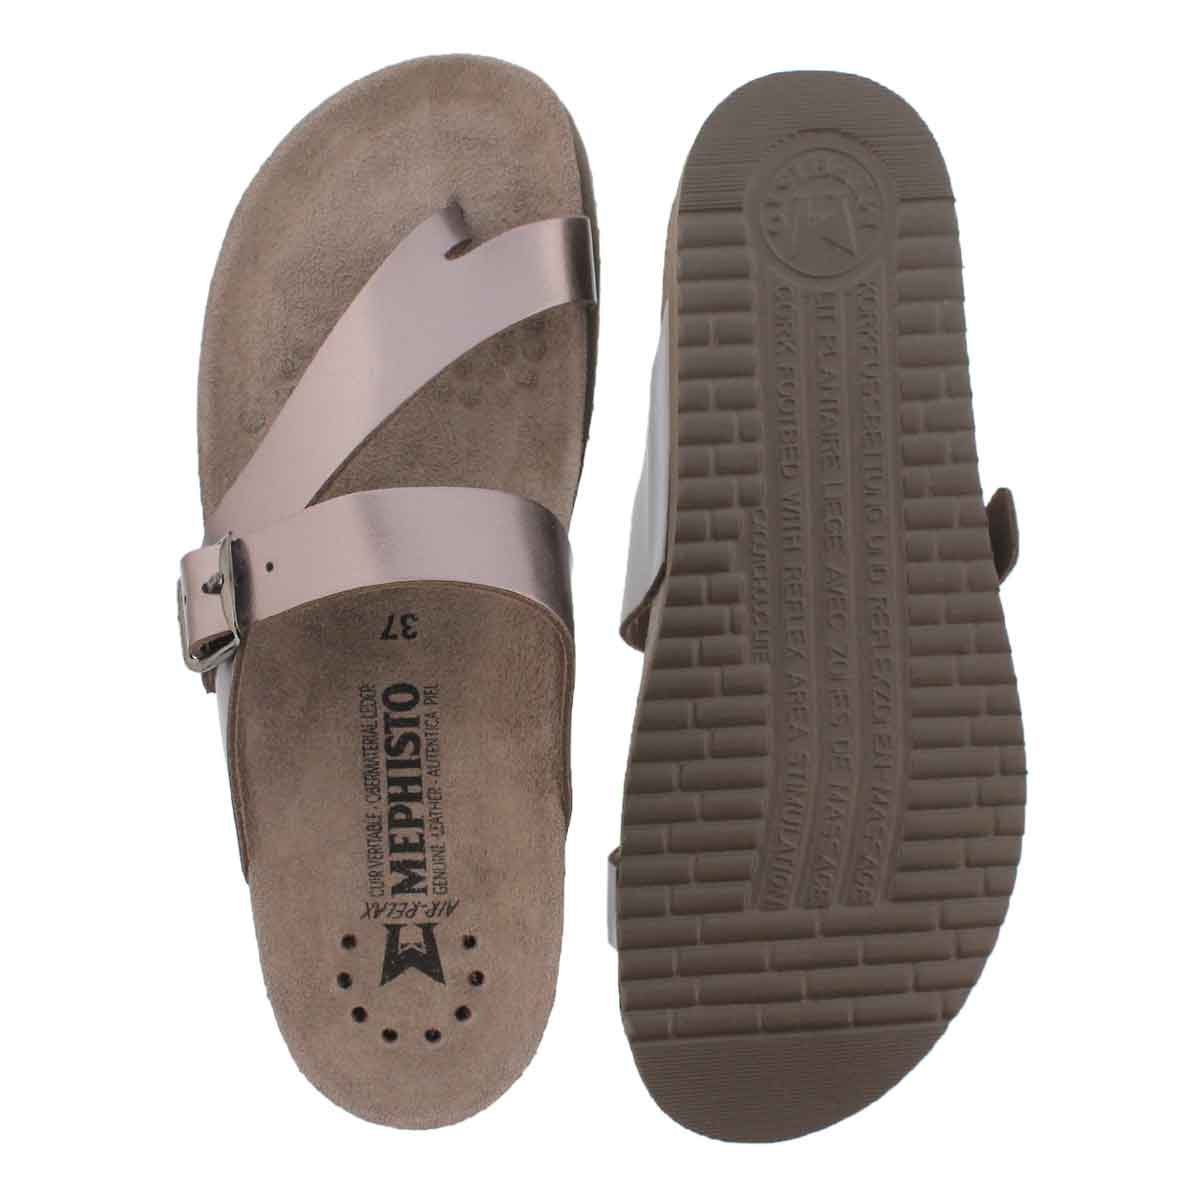 Lds Helen pwtr star cork footbed thong